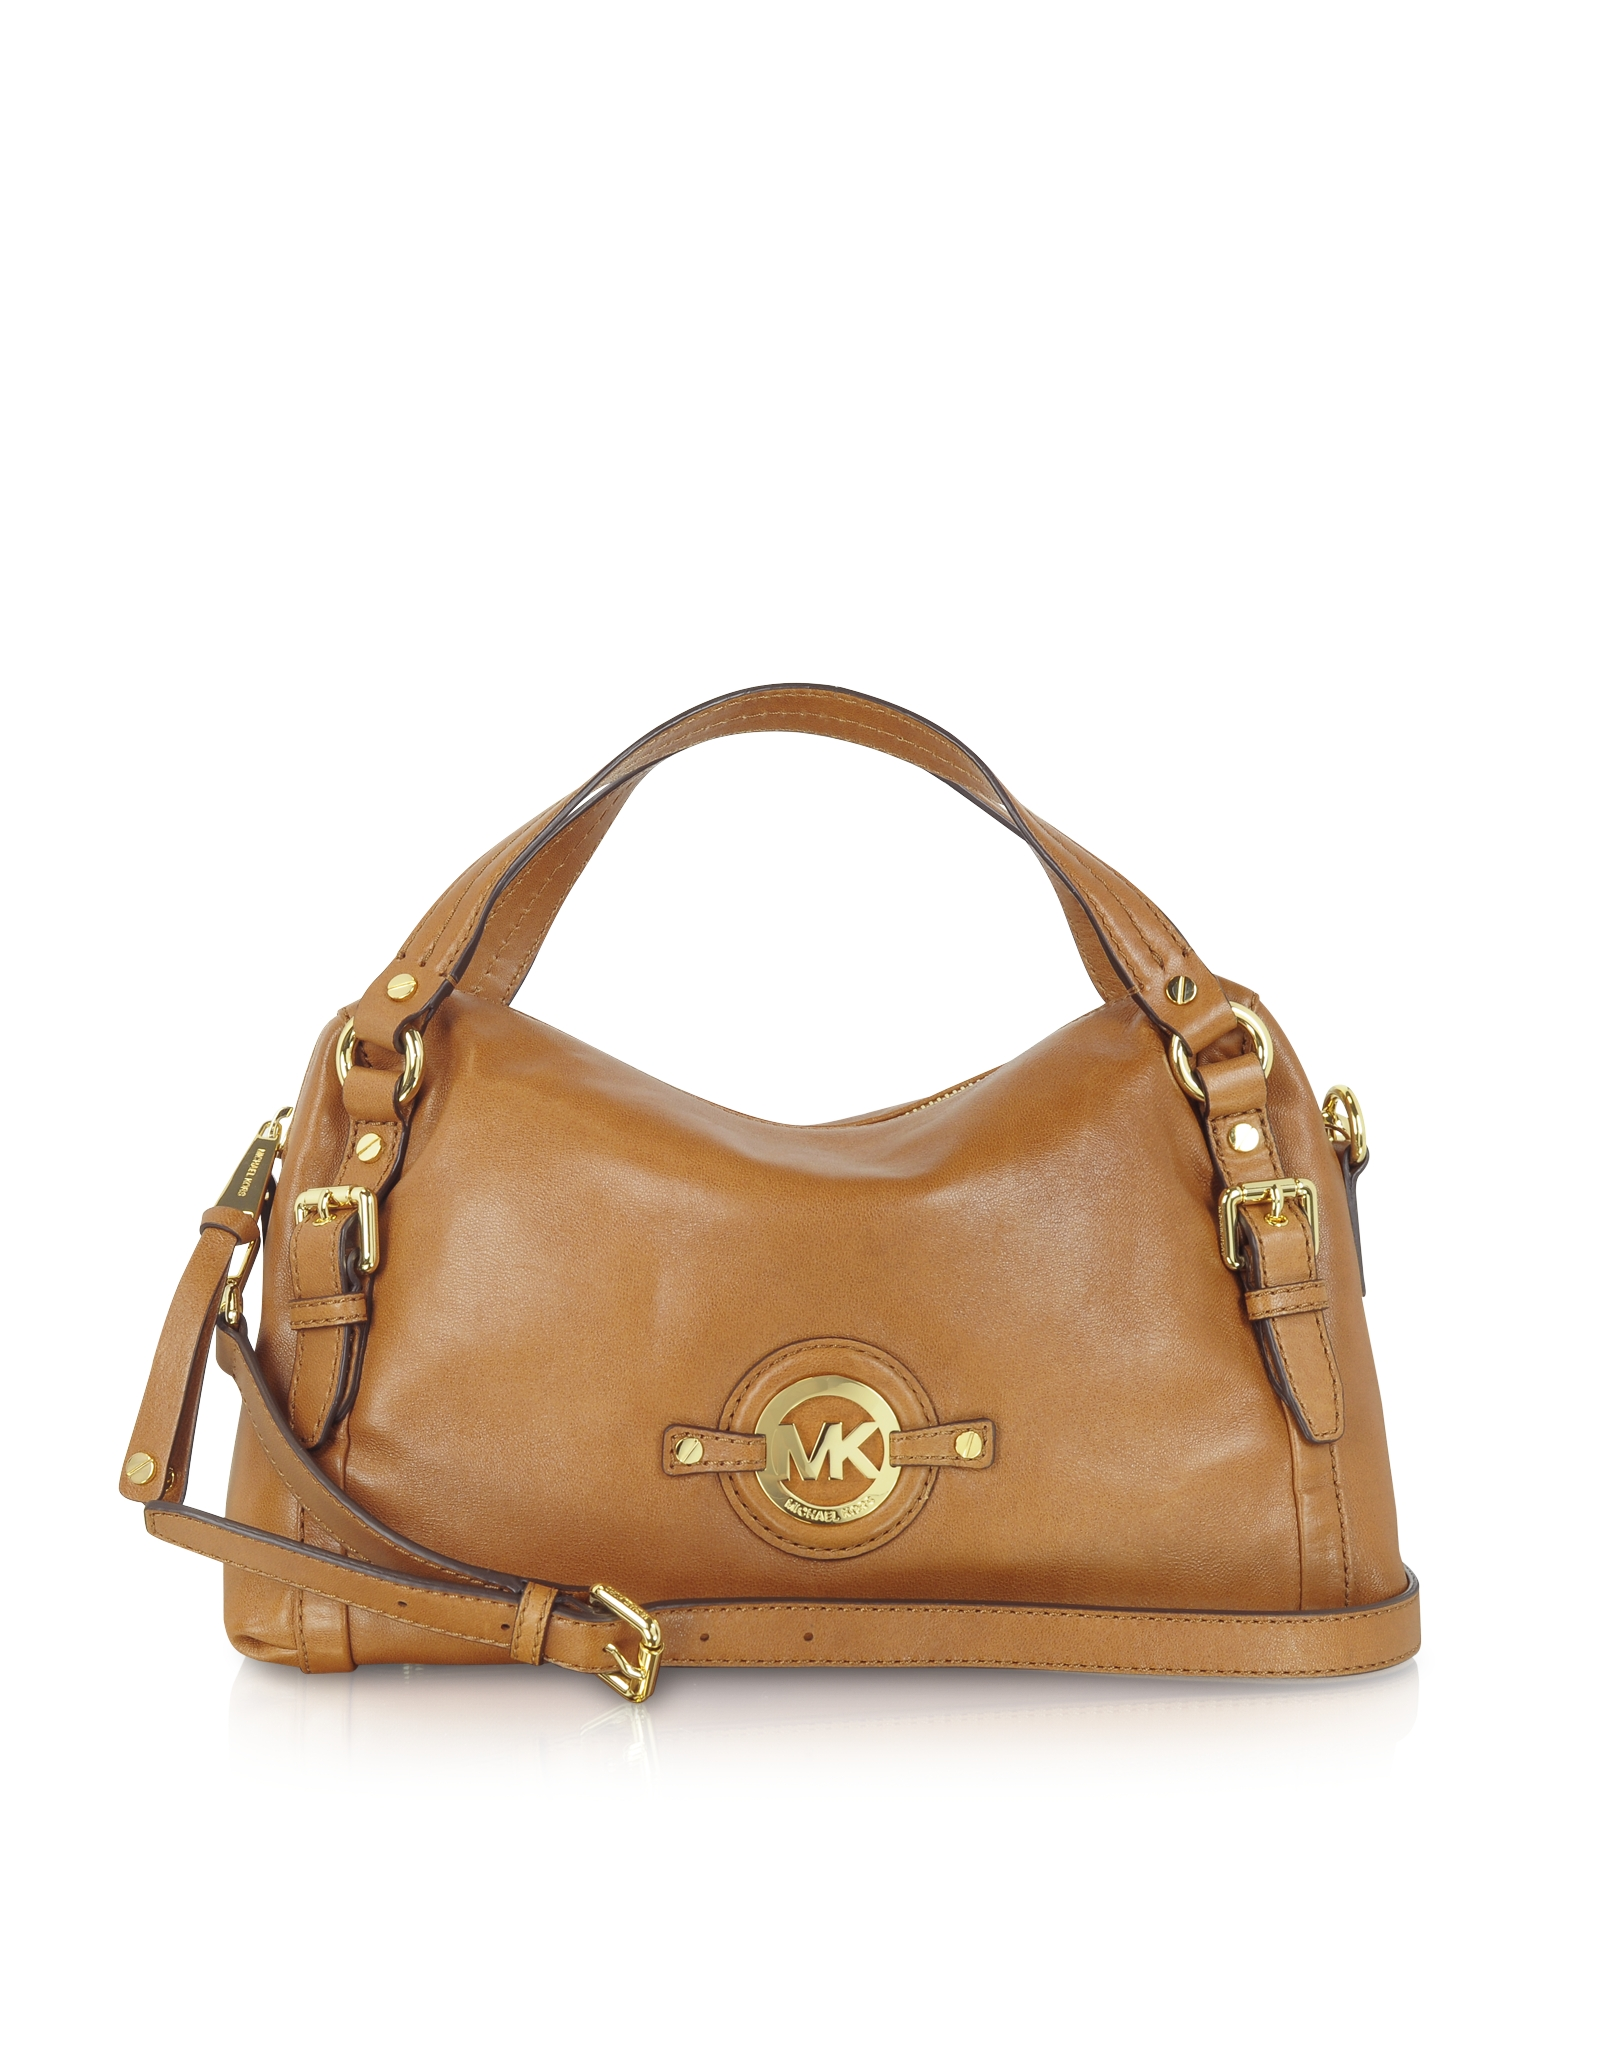 16a0f255136f ... official store lyst michael kors medium stockard shoulder satchel in  brown 6078e 364e7